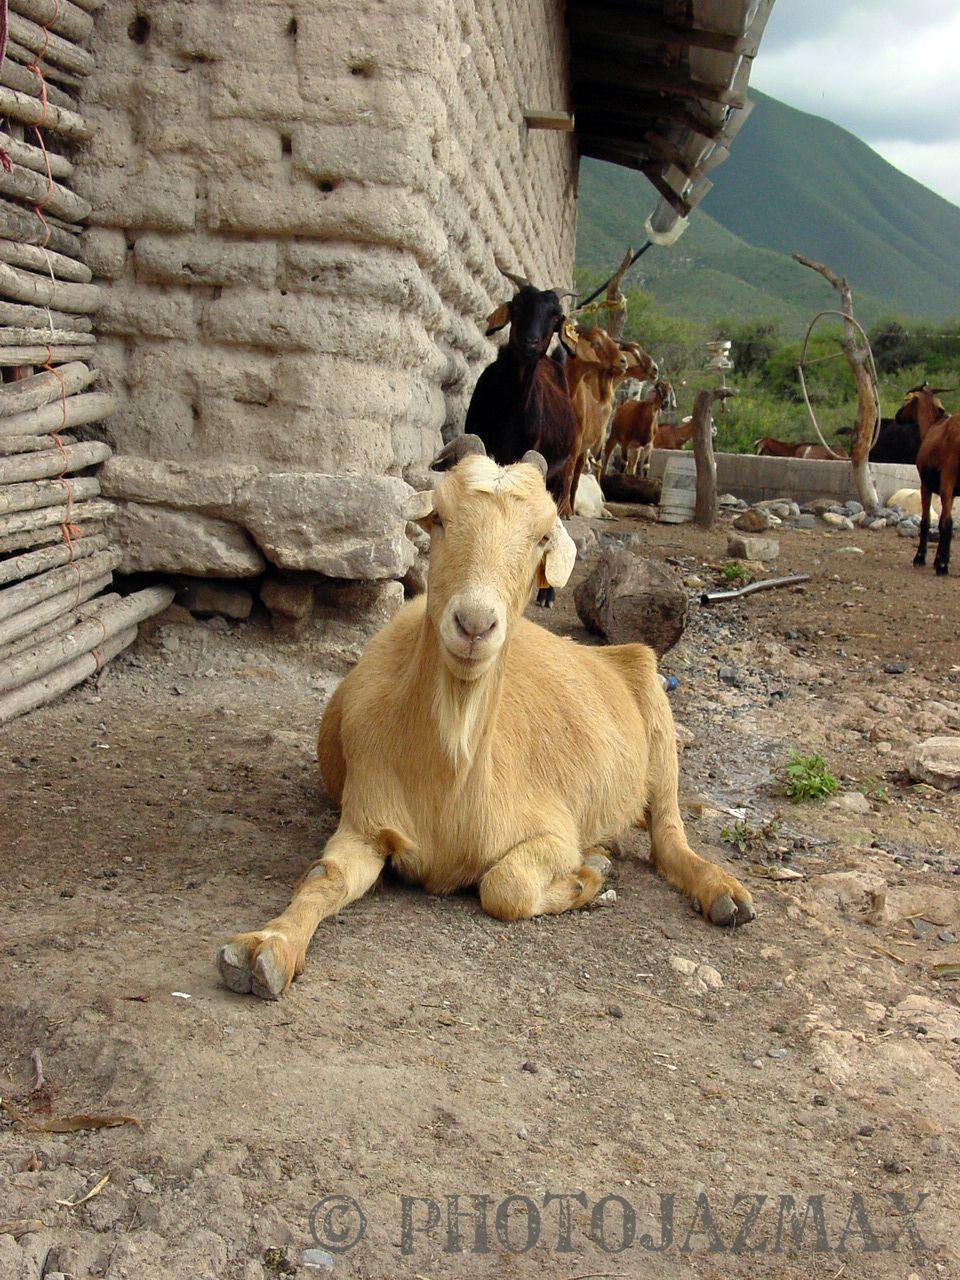 Goat farm tamaulipas mexico cabras